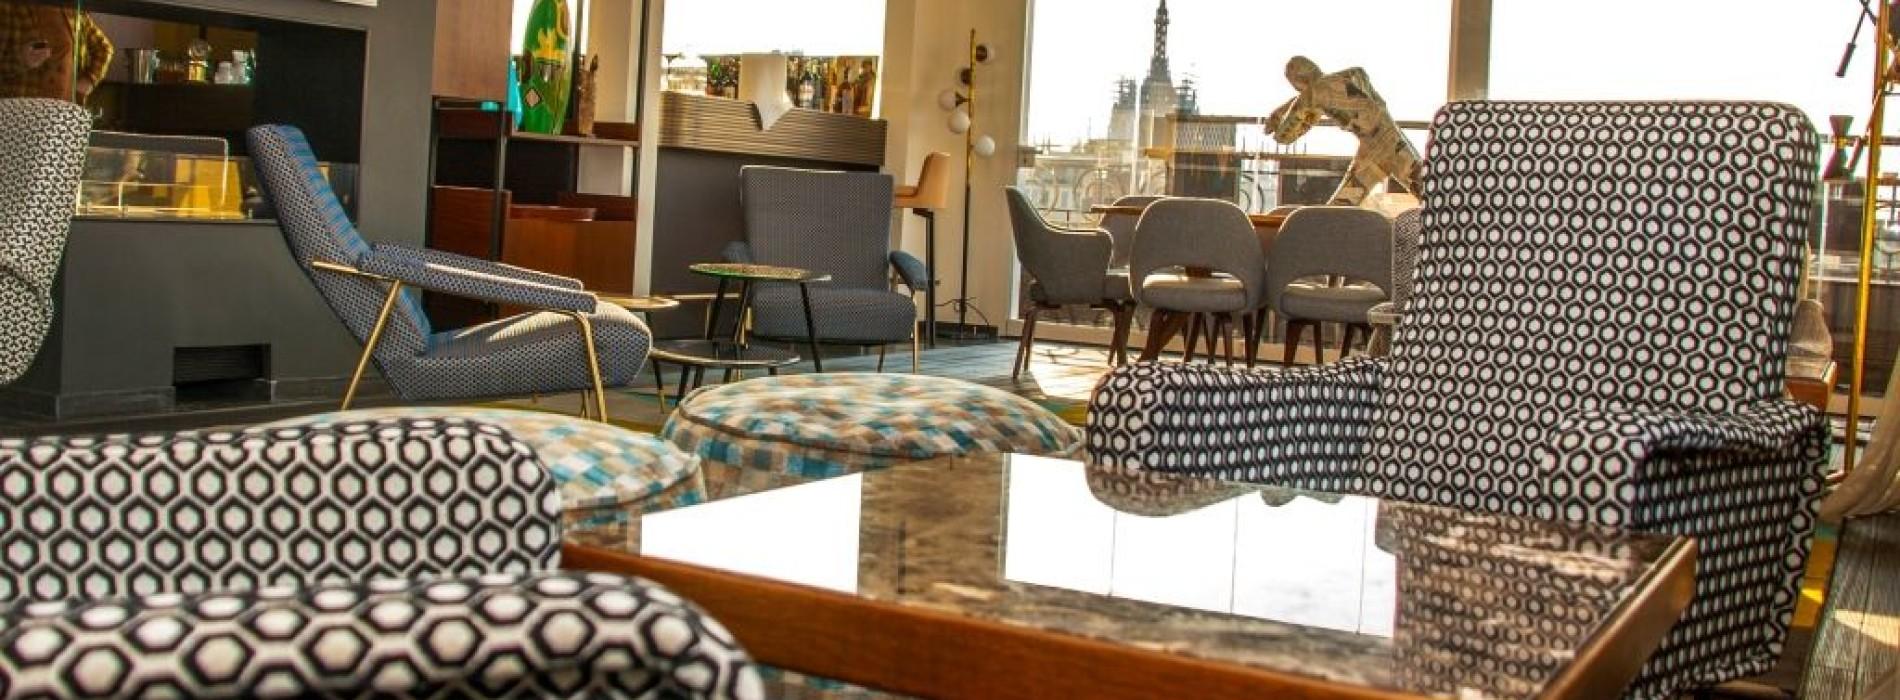 Terrazza 12 a Milano, al Brian & Barry Building cocktail d'autore e cucina gourmet